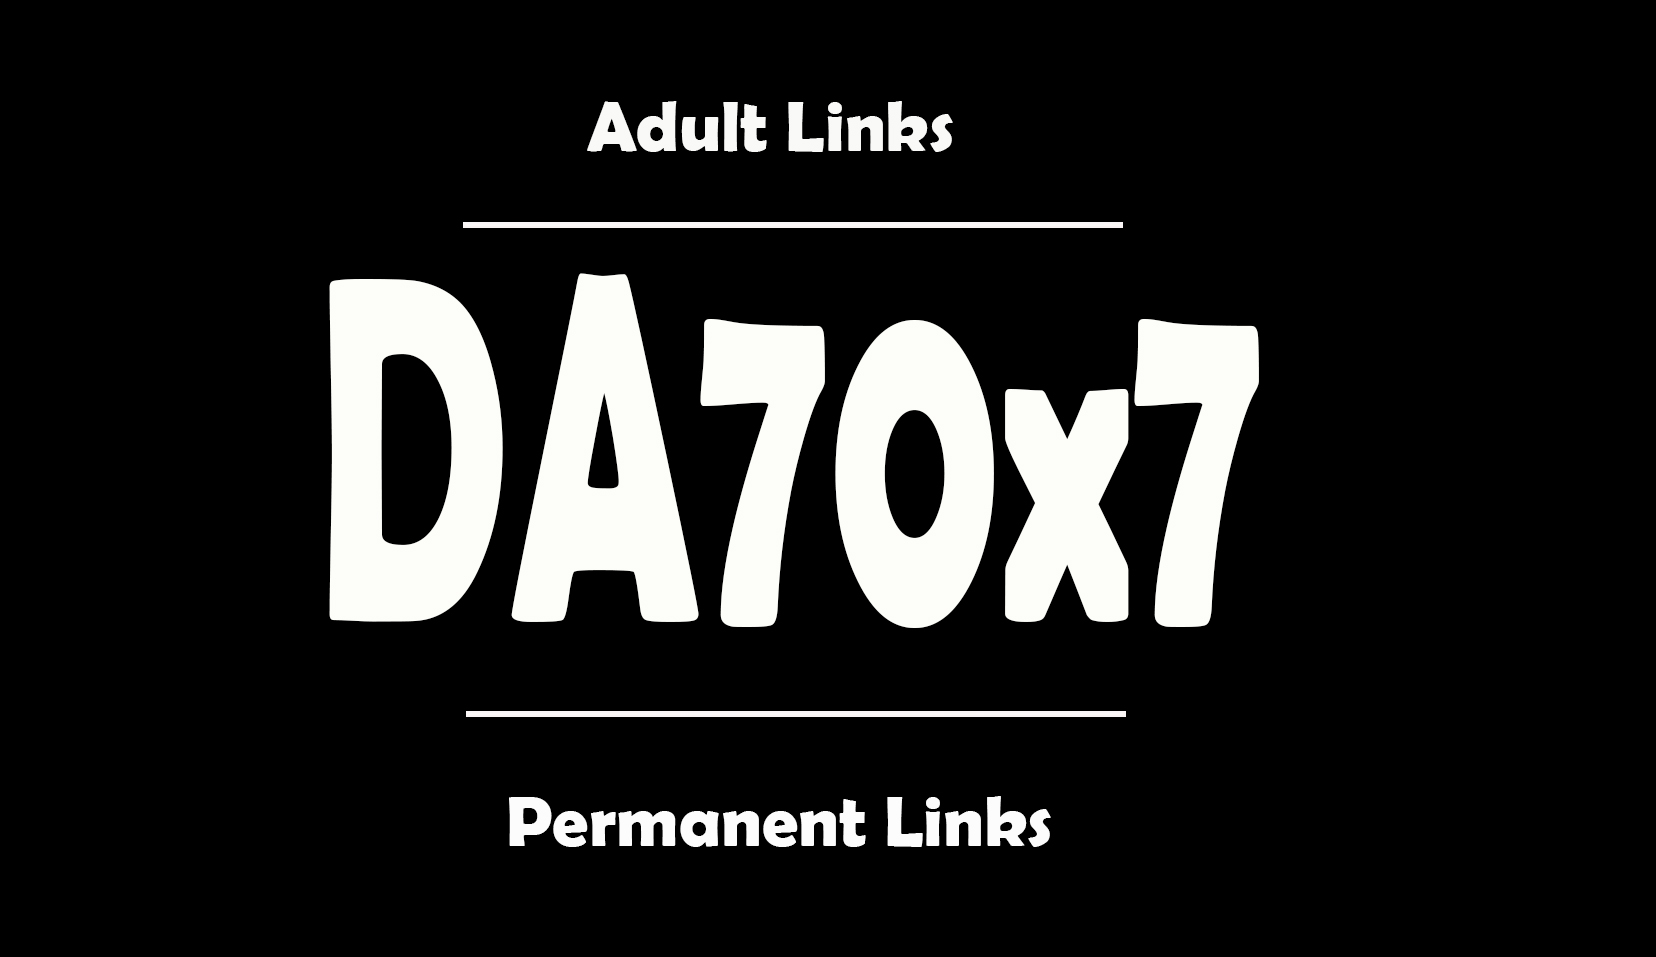 I will do backlinks DA70x7 adult permanent blogroll